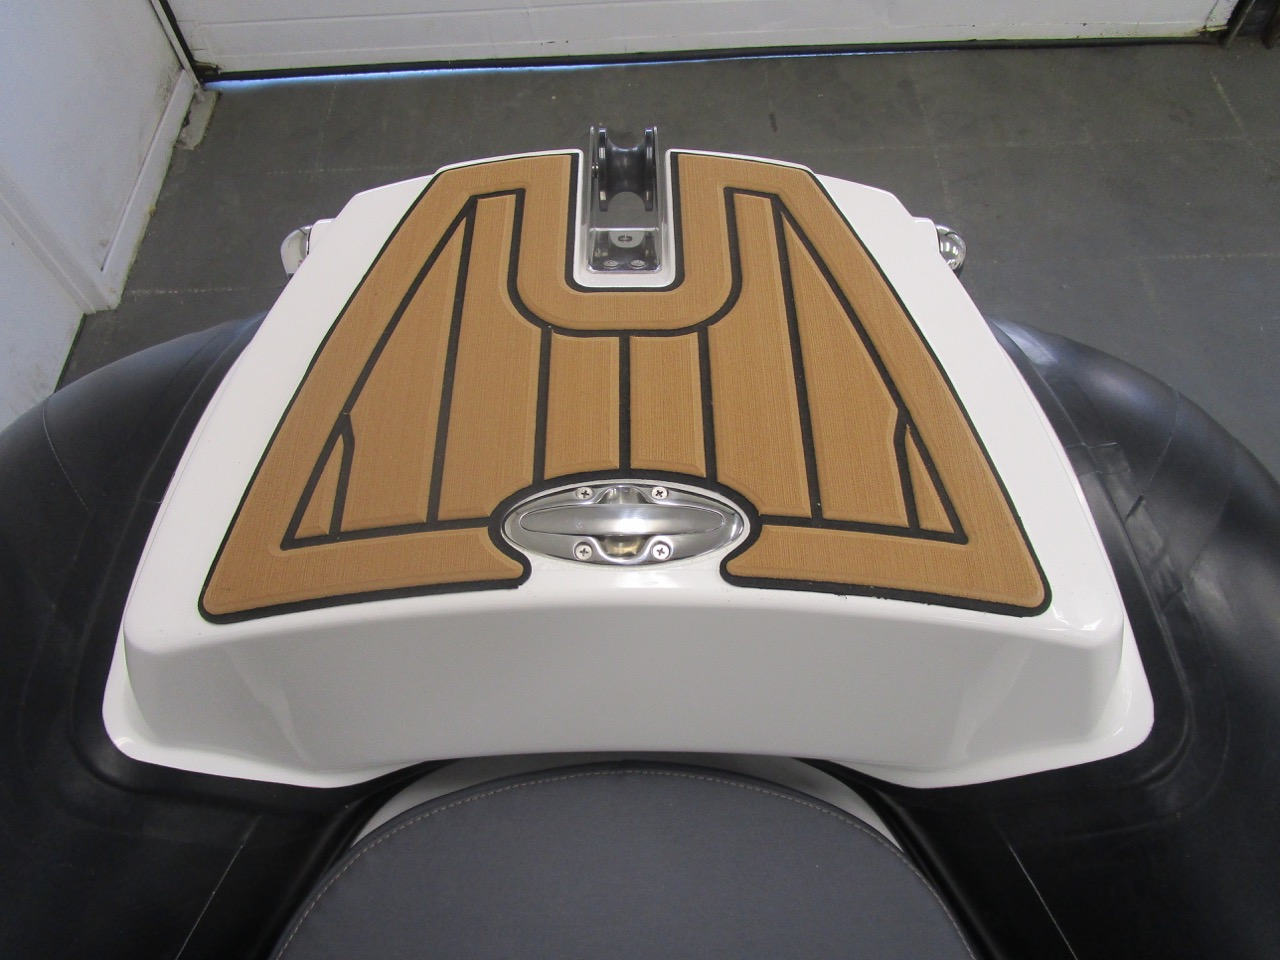 GRAND Golden Line G580 RIB bow footplate